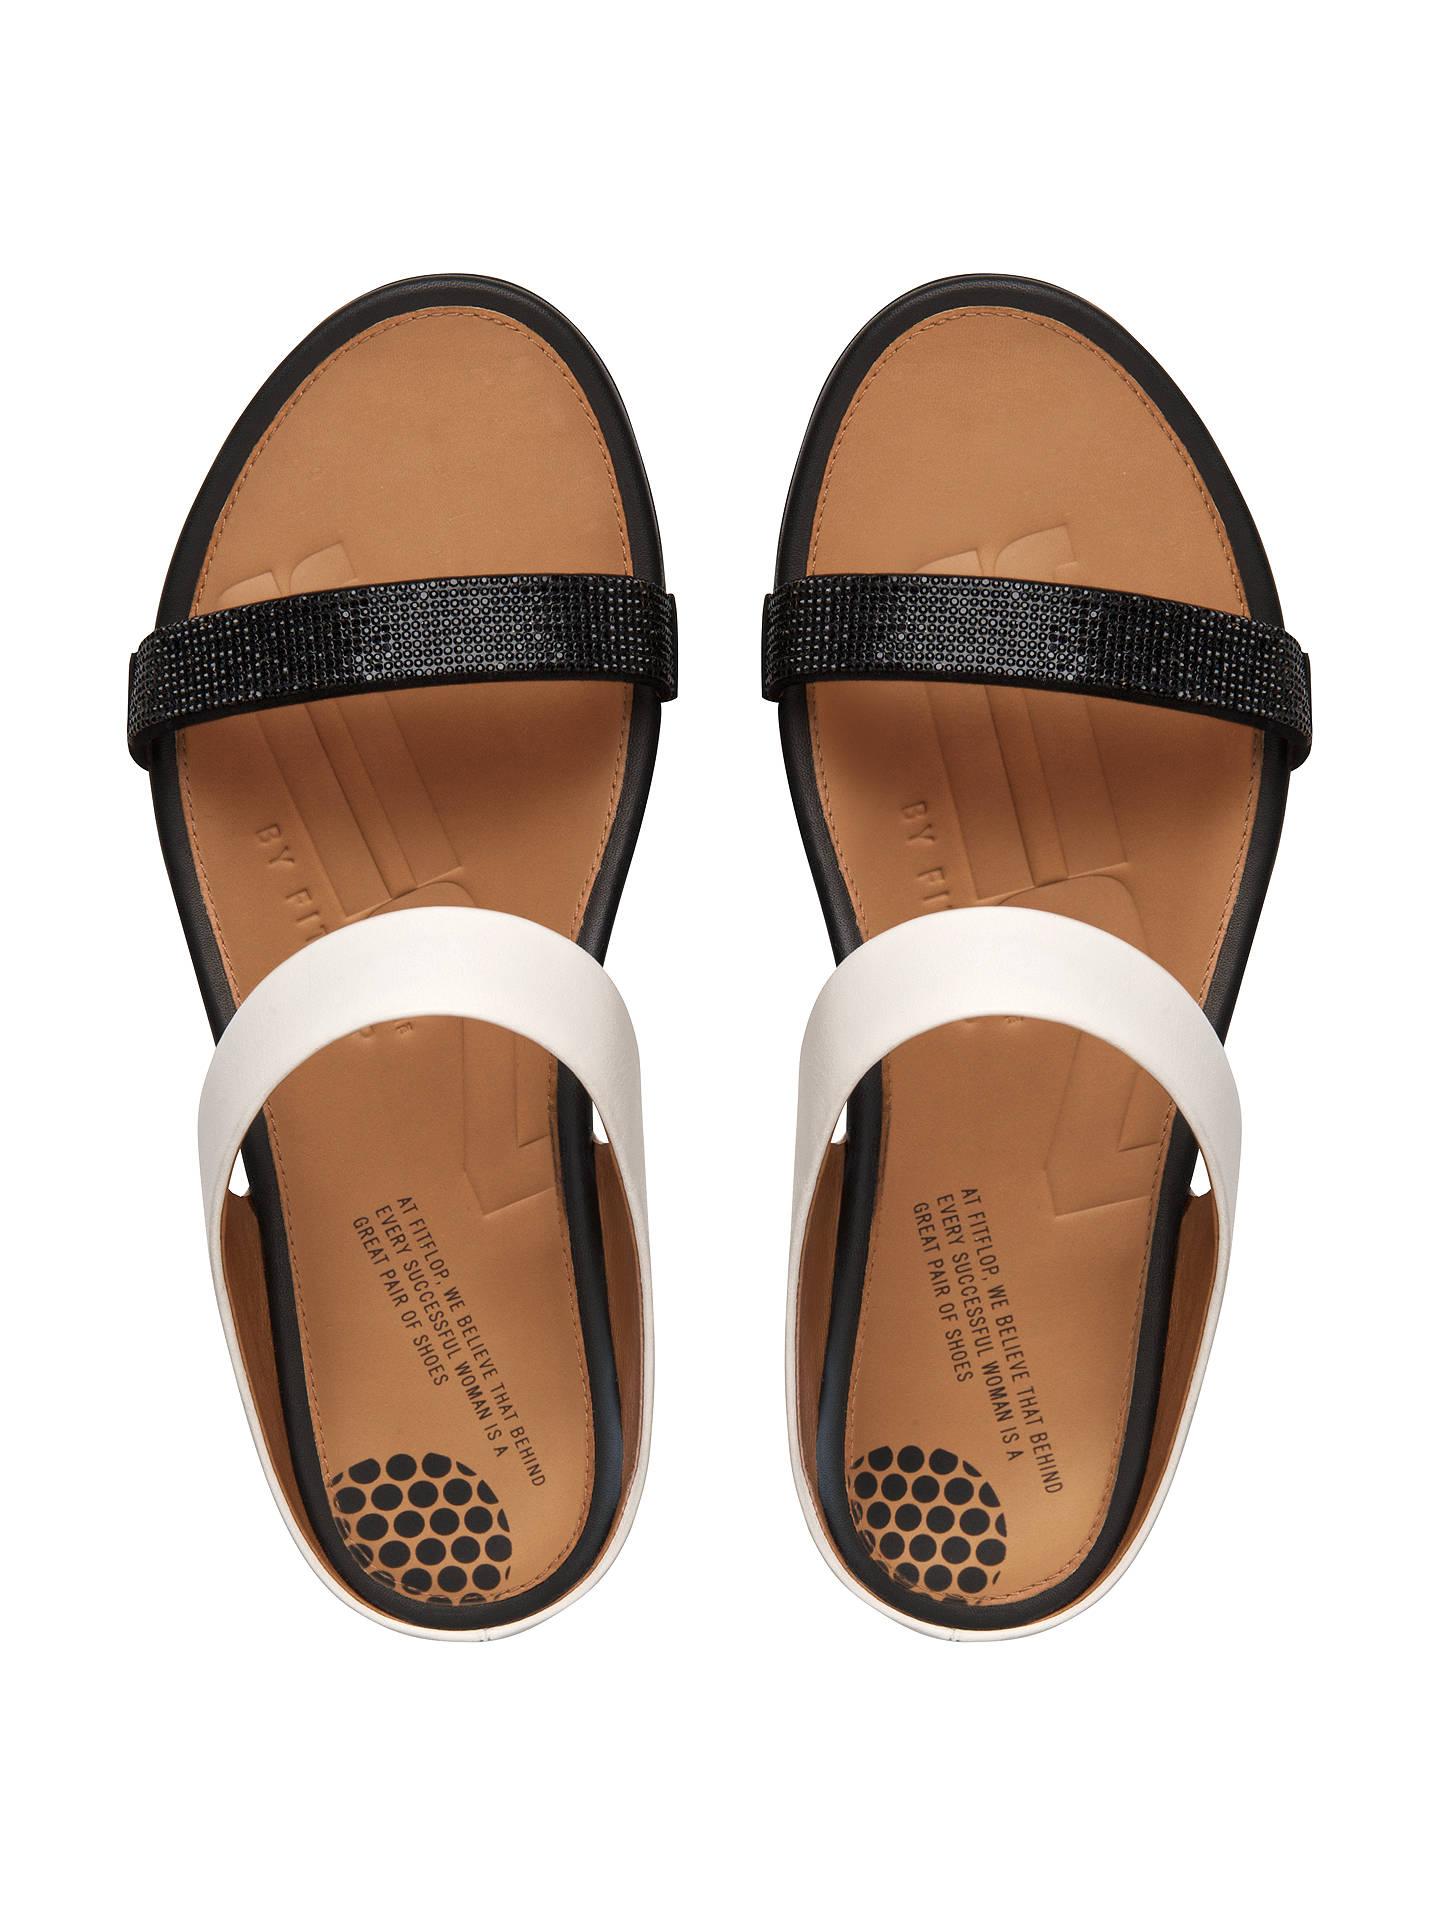 241a7eb40da ... Buy FitFlop Banda Crystal Slide Leather Sandals